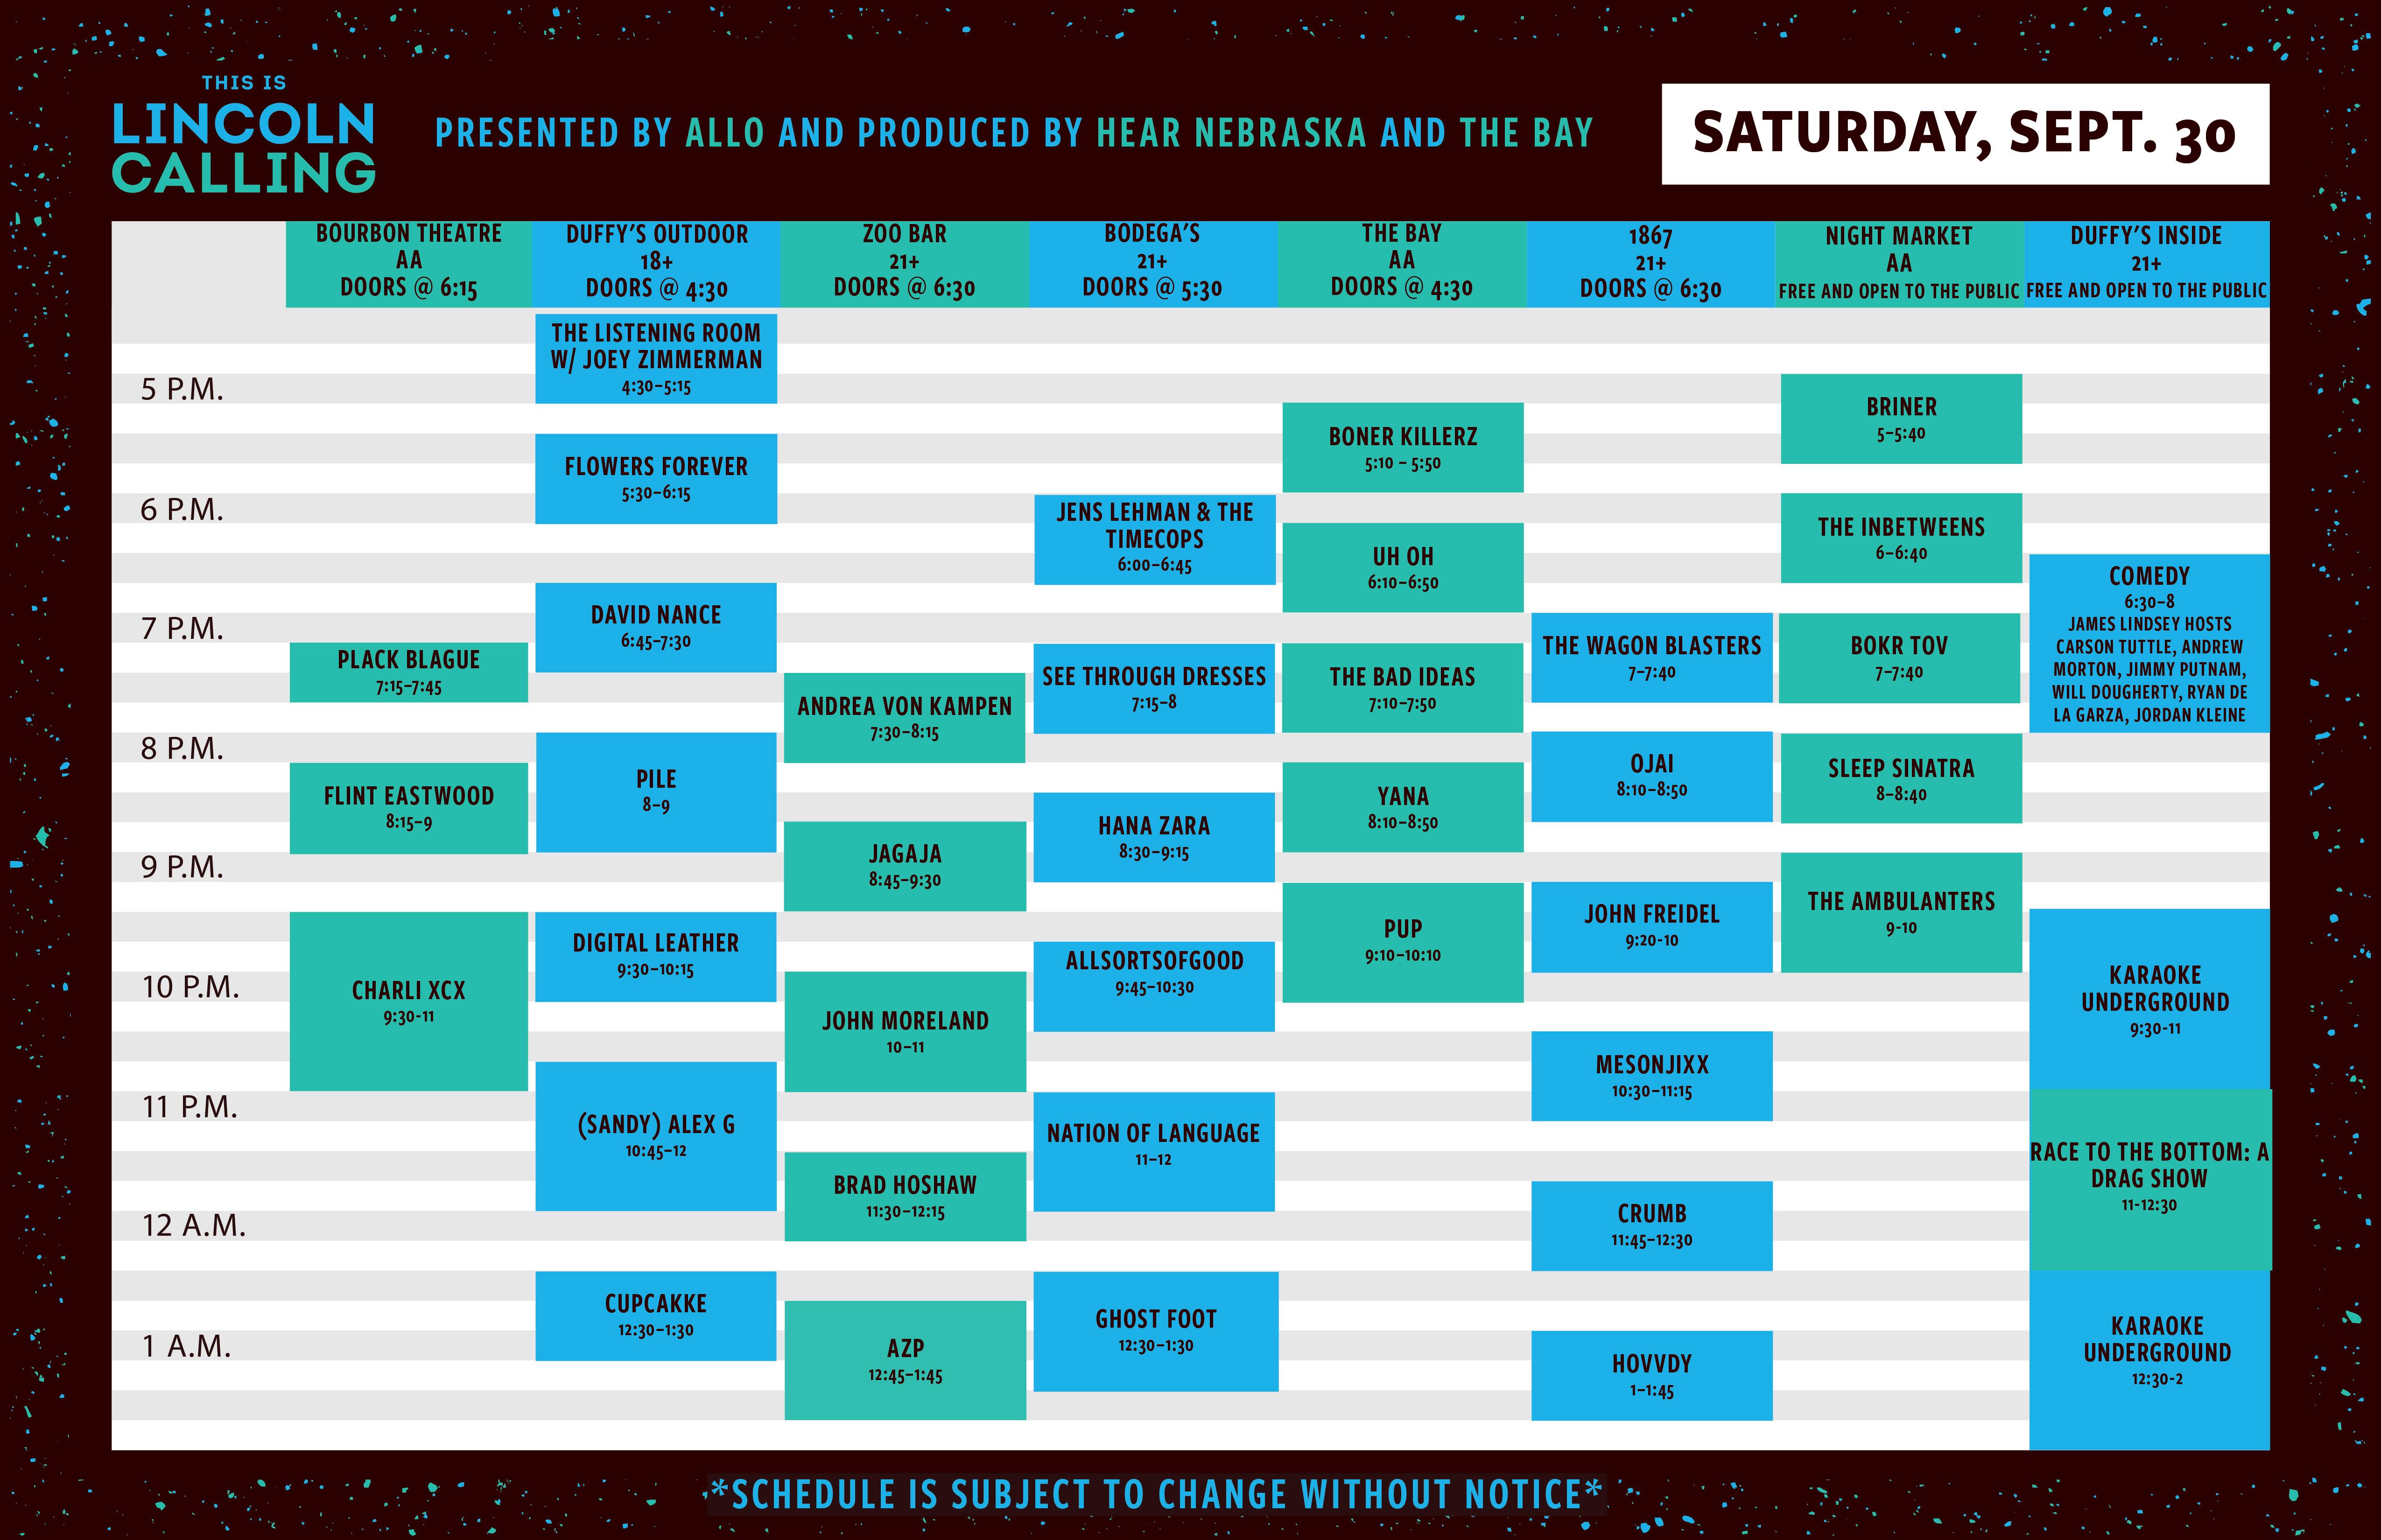 The 2017 Lincoln Calling Music Festival Digital Guide